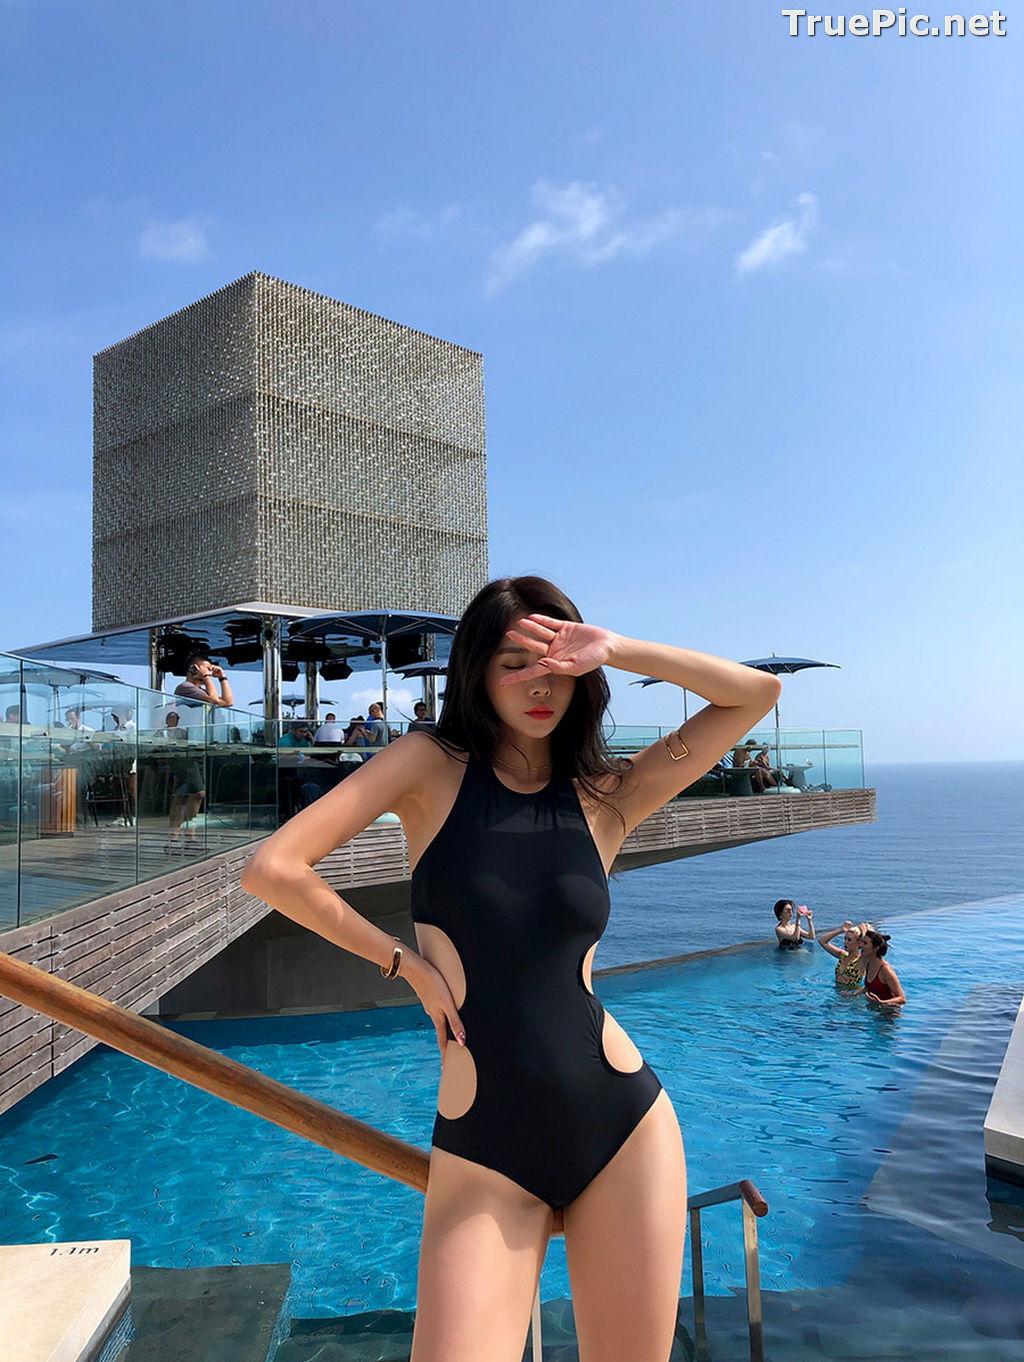 Image Kwon Byul - Korean Fashion Model - Black Monokini - TruePic.net - Picture-7